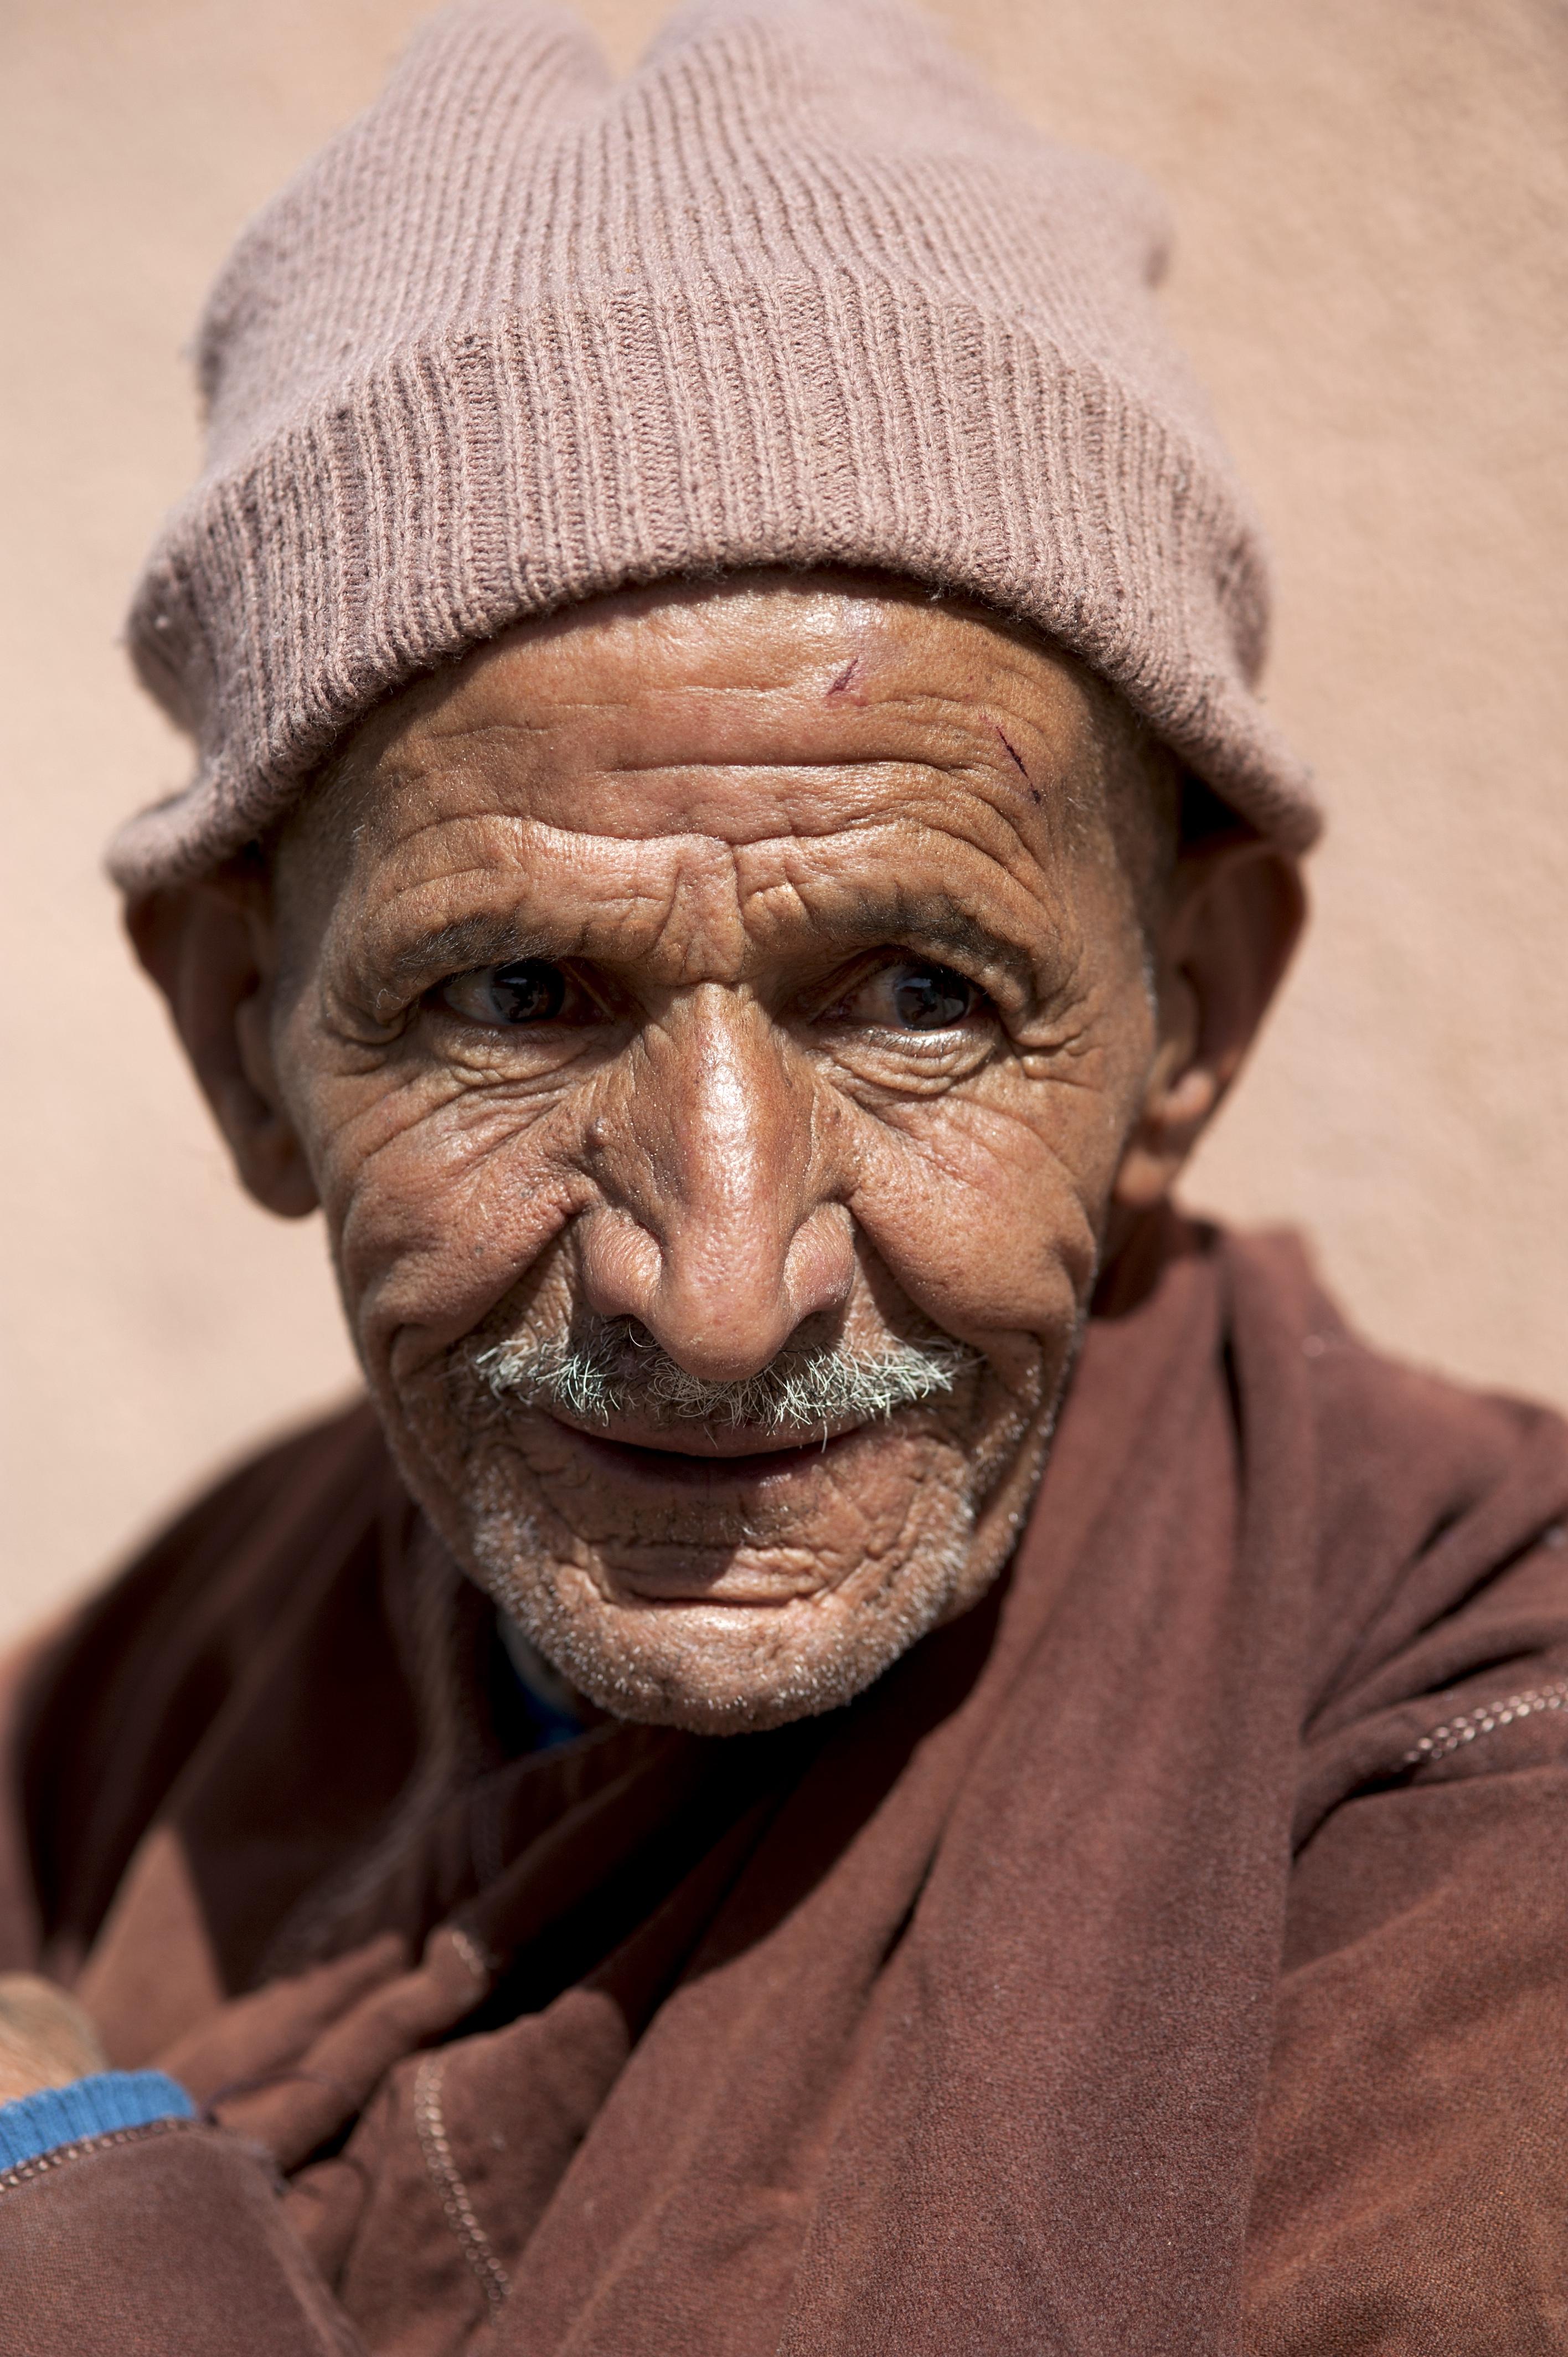 Blind man in Atlas village